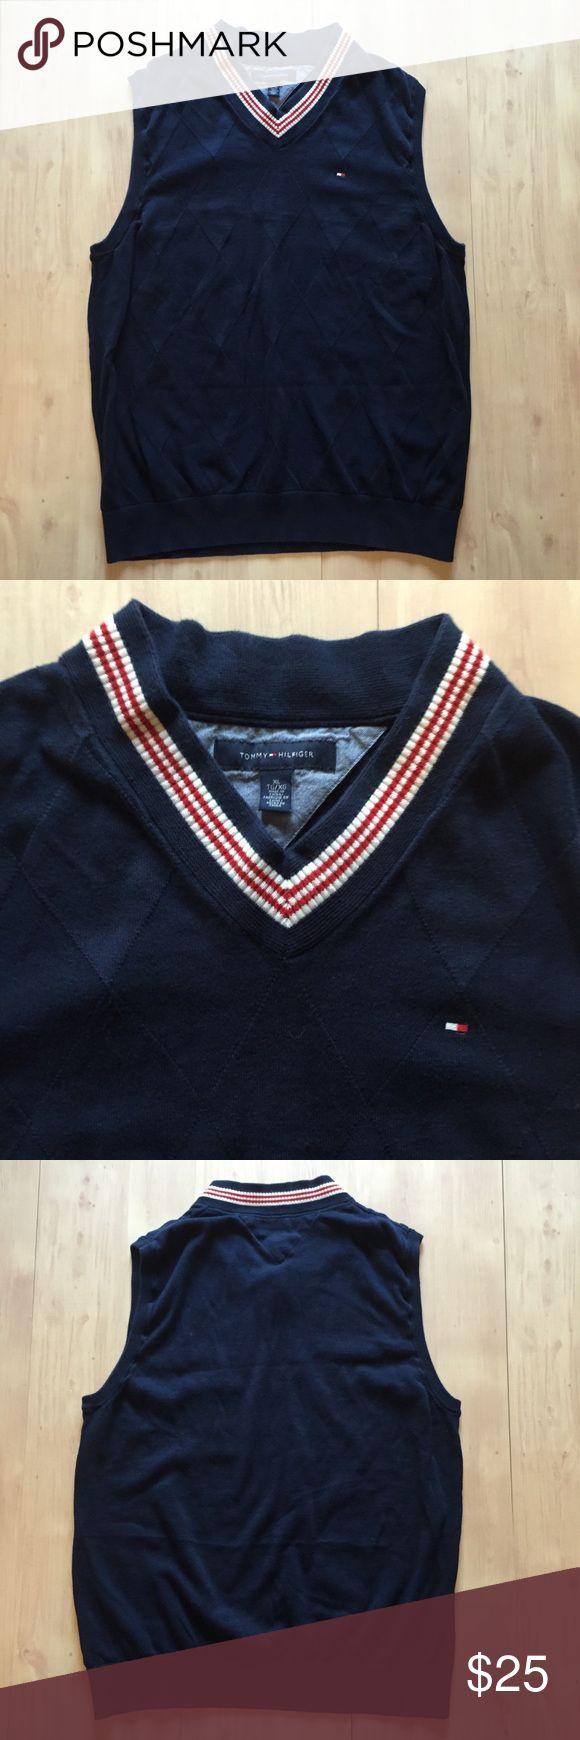 Best 25  Mens sweater vest ideas on Pinterest | Smart casual man ...